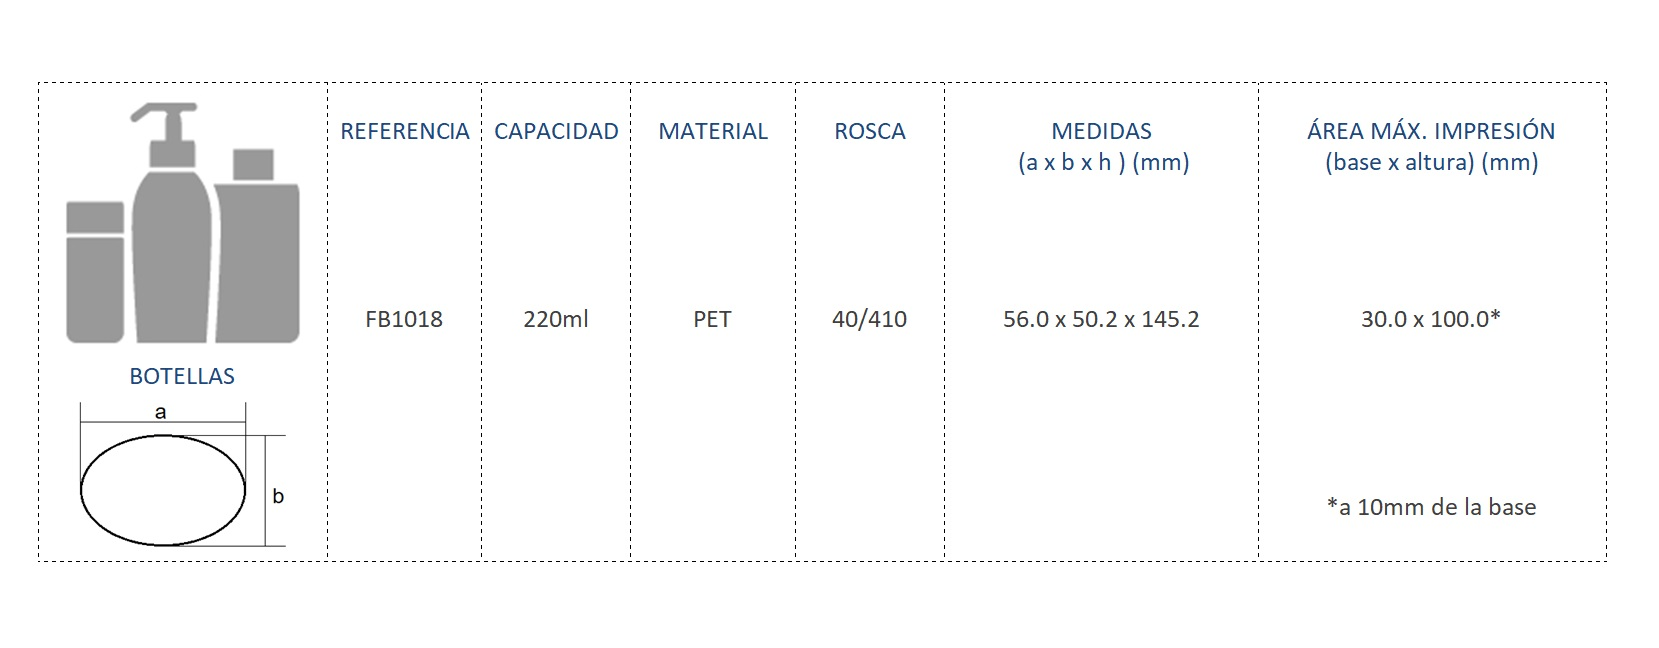 Cuadro de materiales botella FB1018